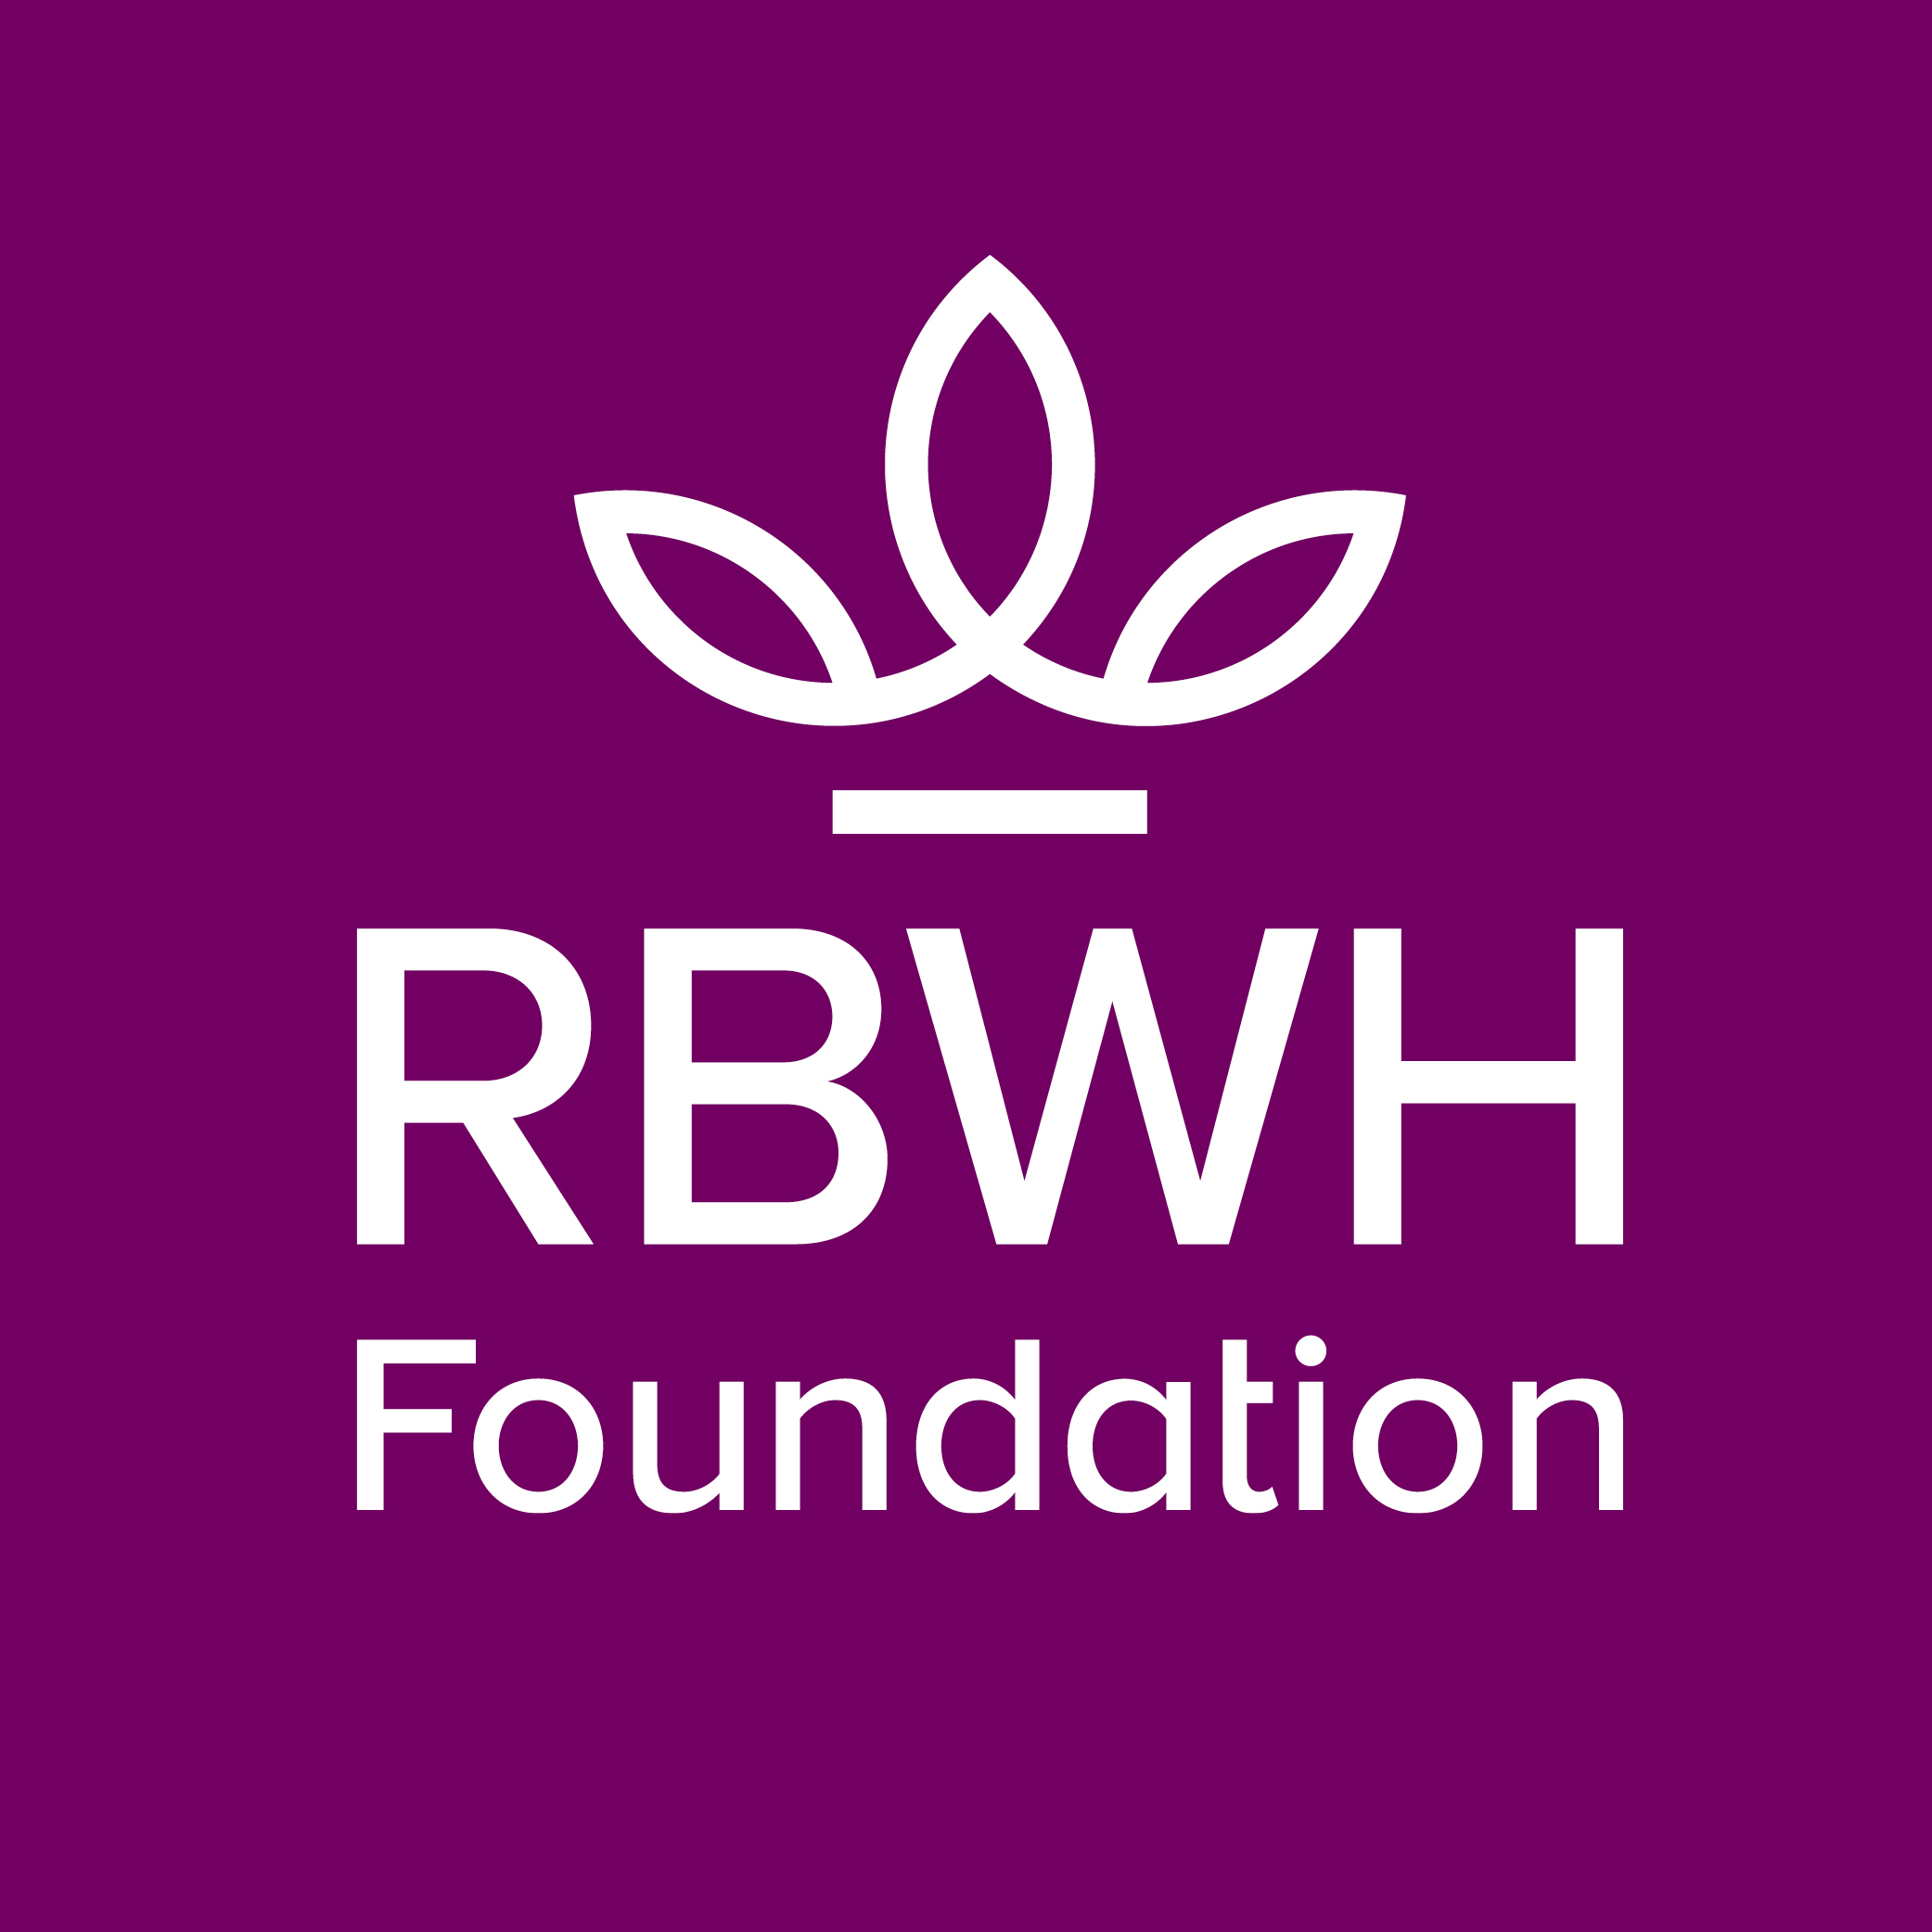 RBWH Foundation